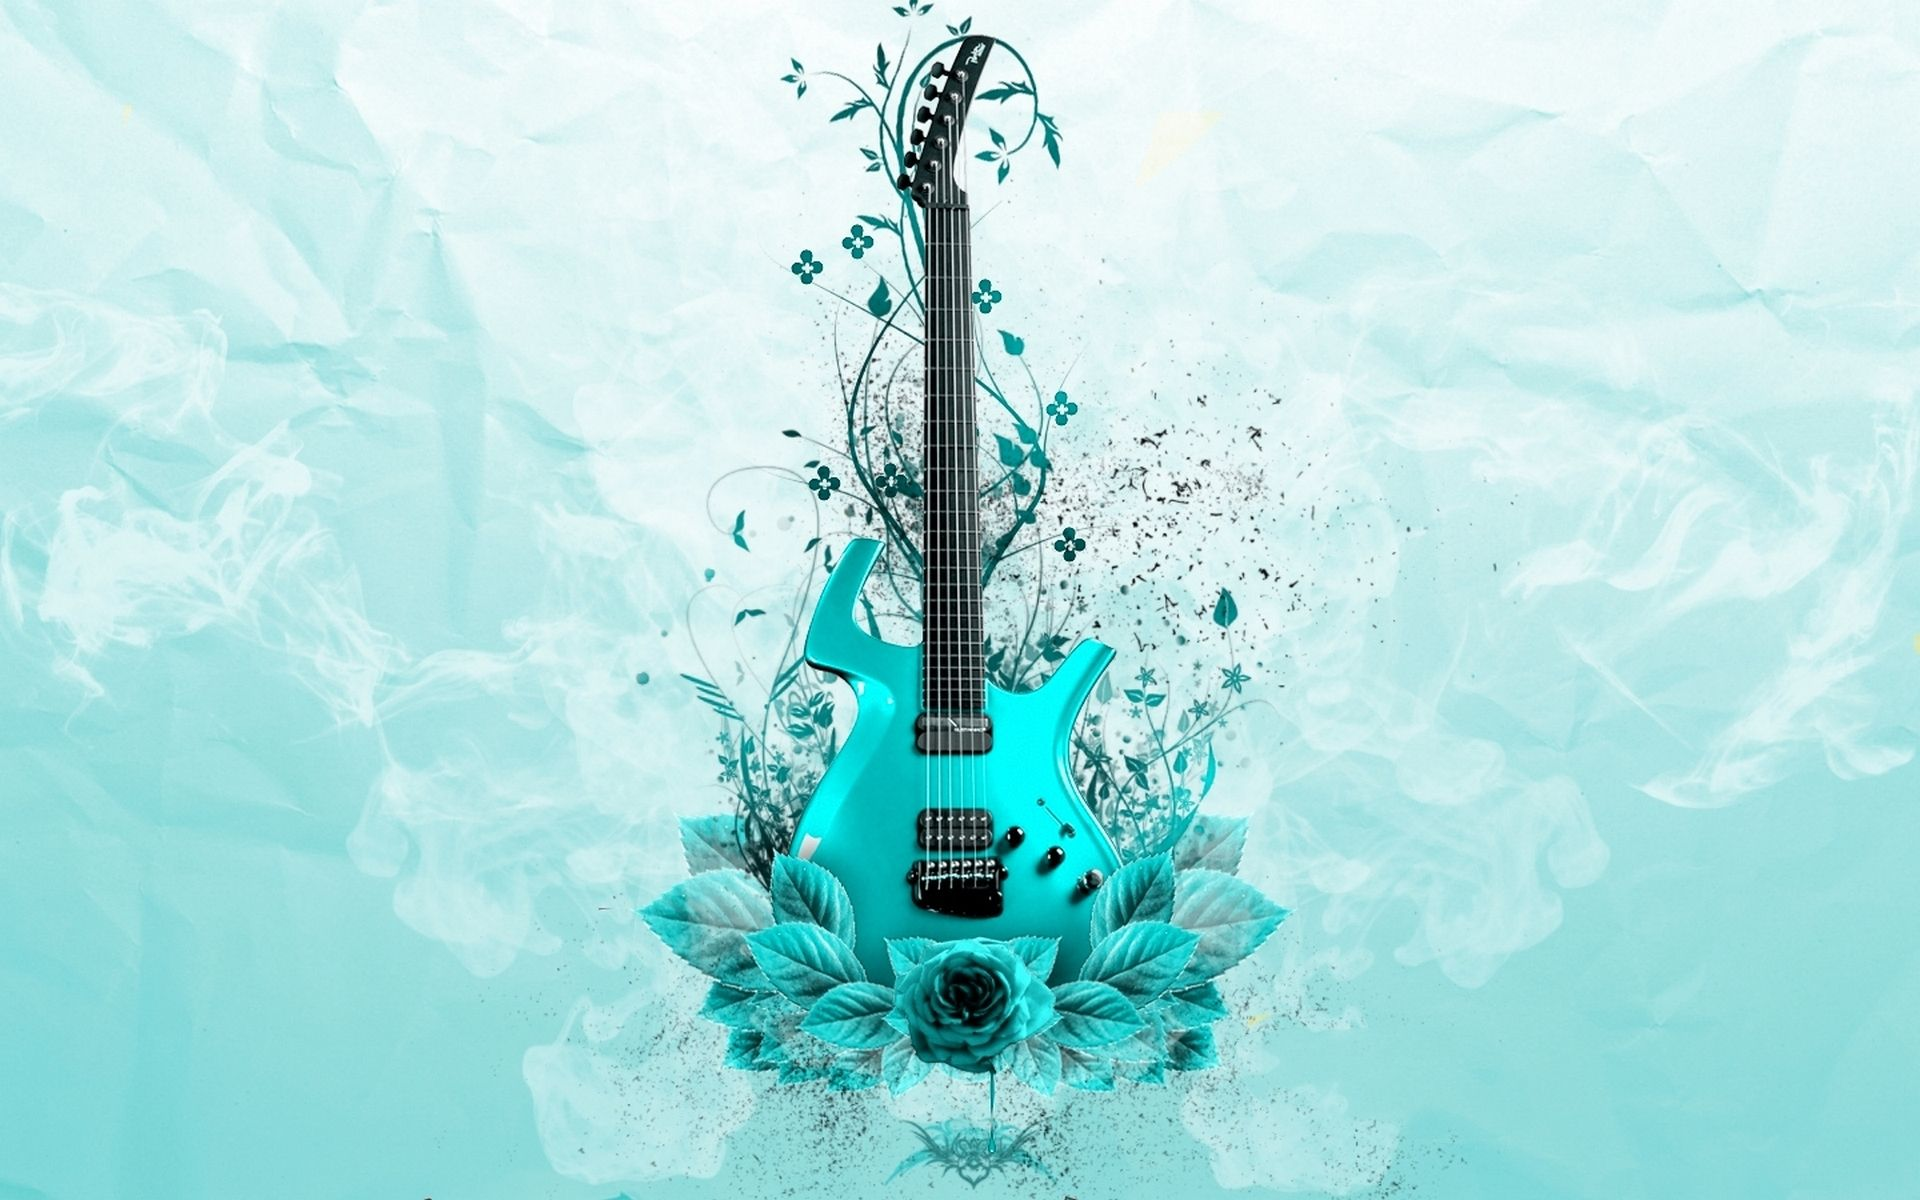 Guitar Abstract, Desktop Wallpaper